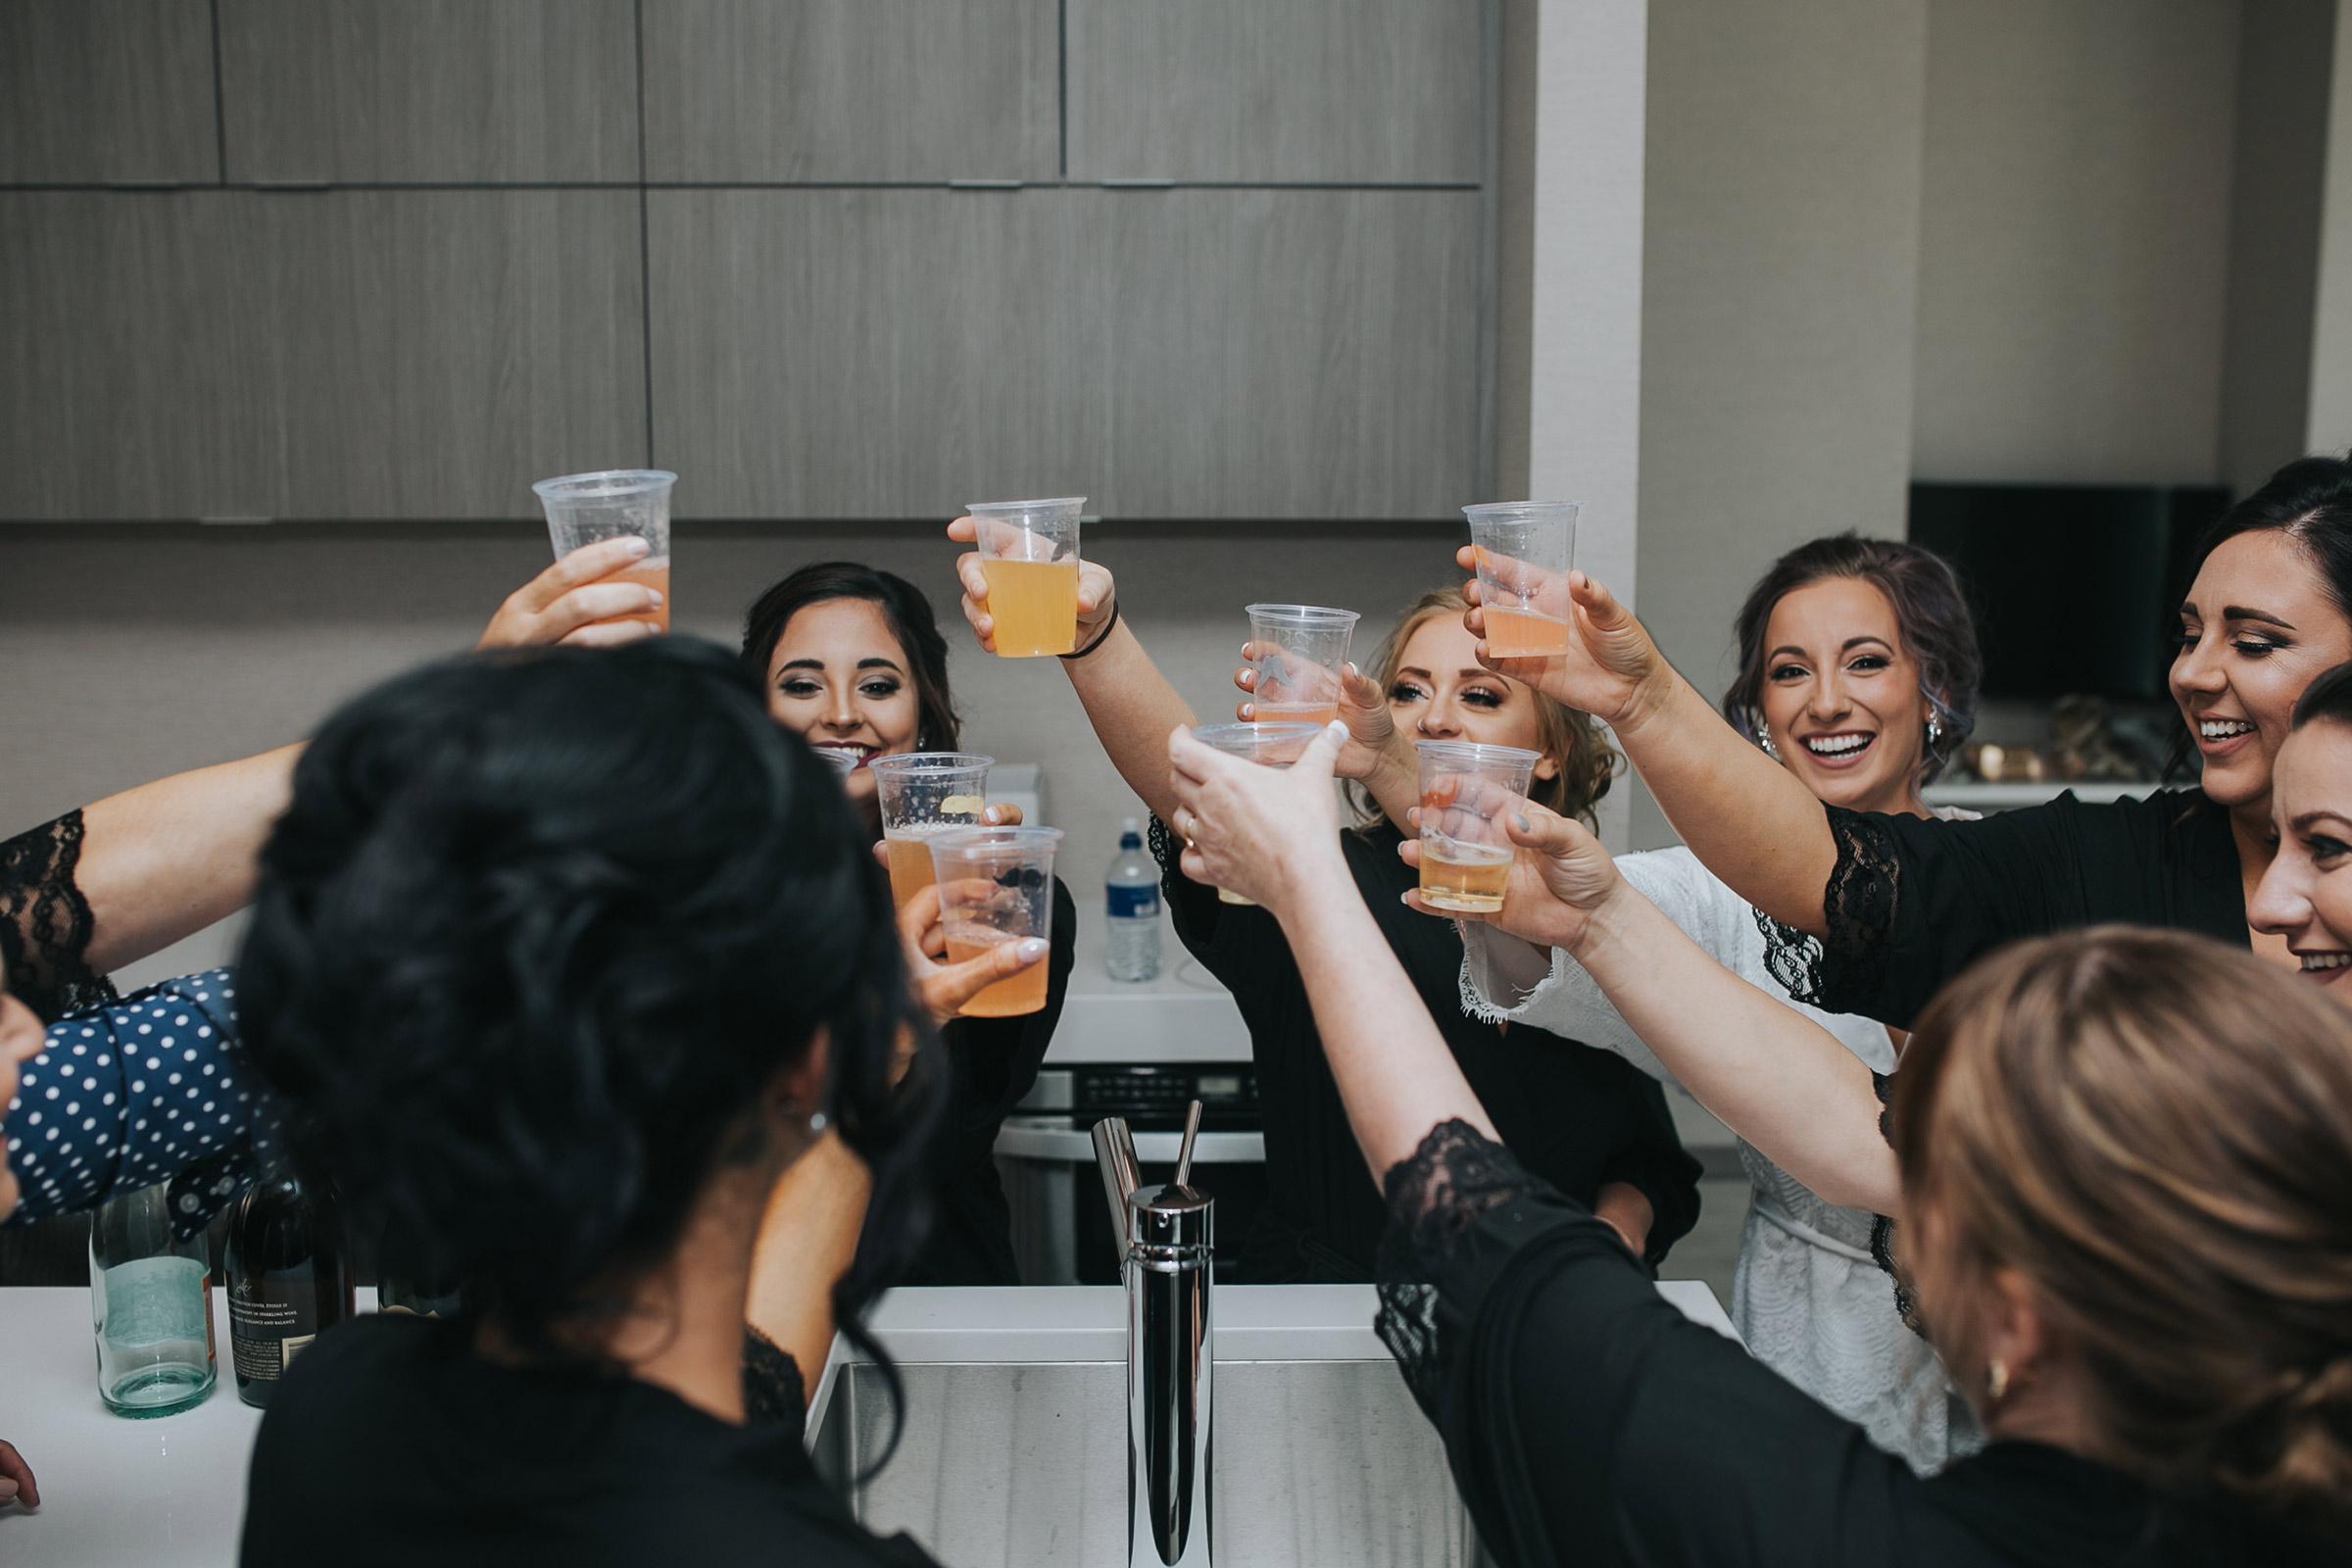 bridesmaids-cheers-before-getting-ready-desmoines-iowa-ac-hotel-raelyn-ramey-photography.jpg